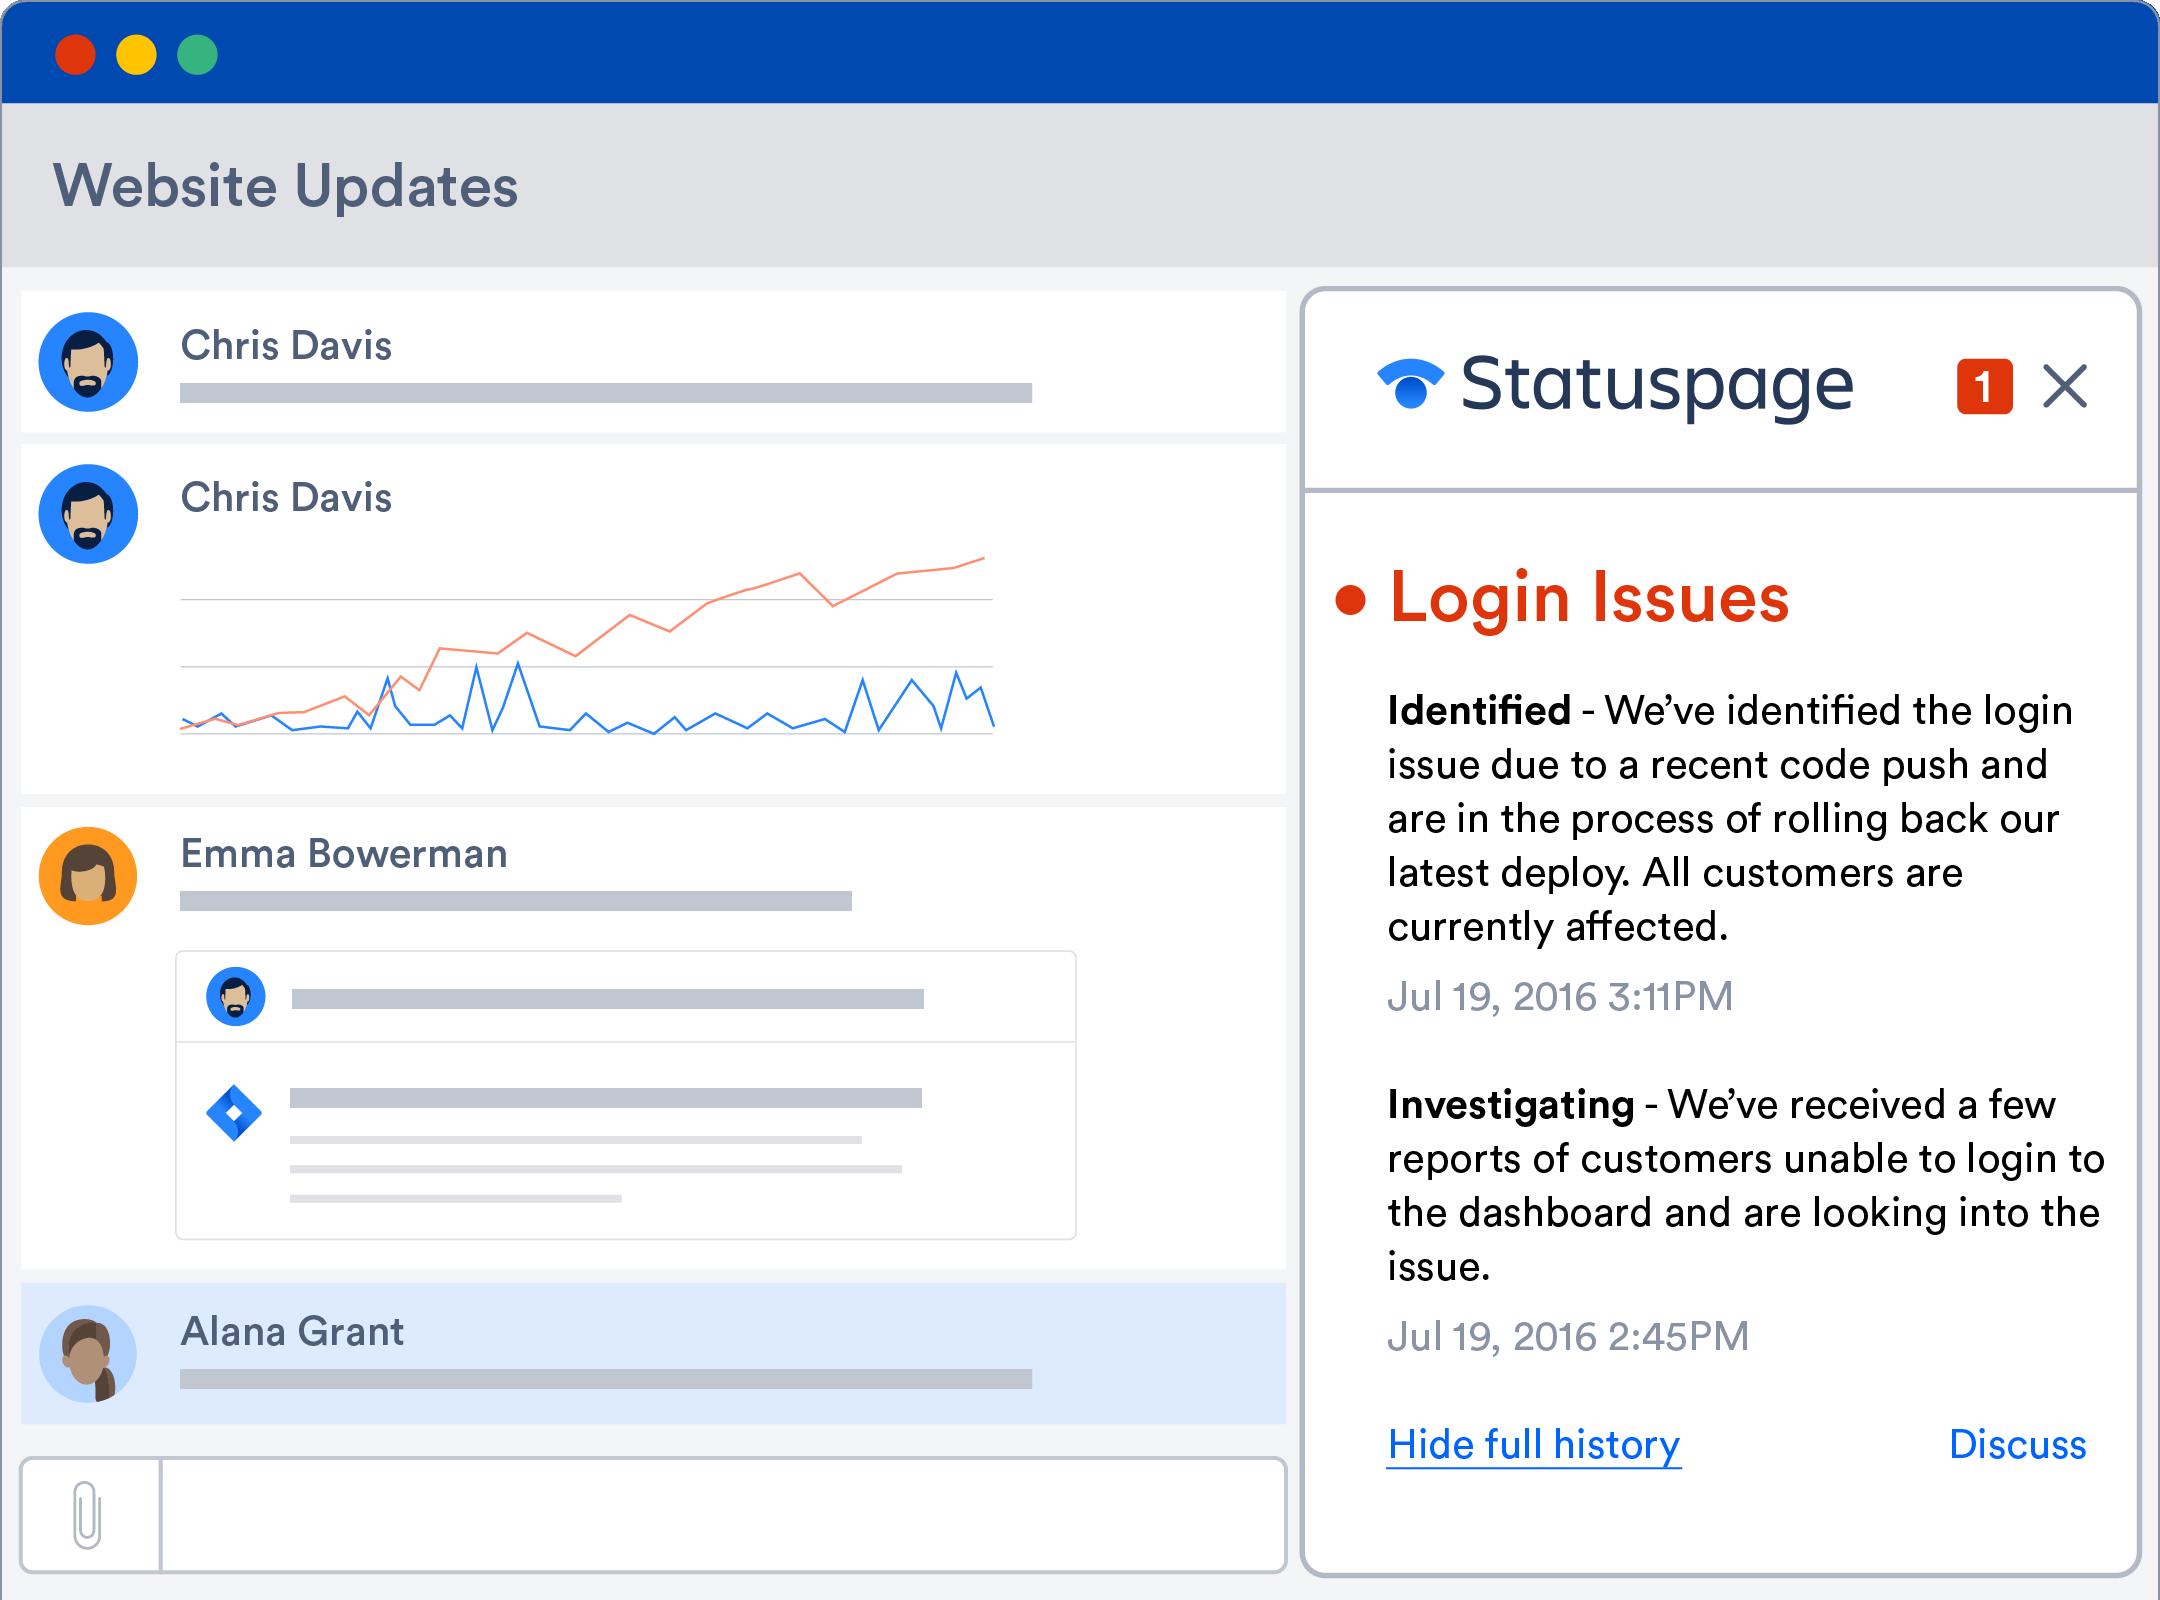 Интеграция Statuspage в Hipchat